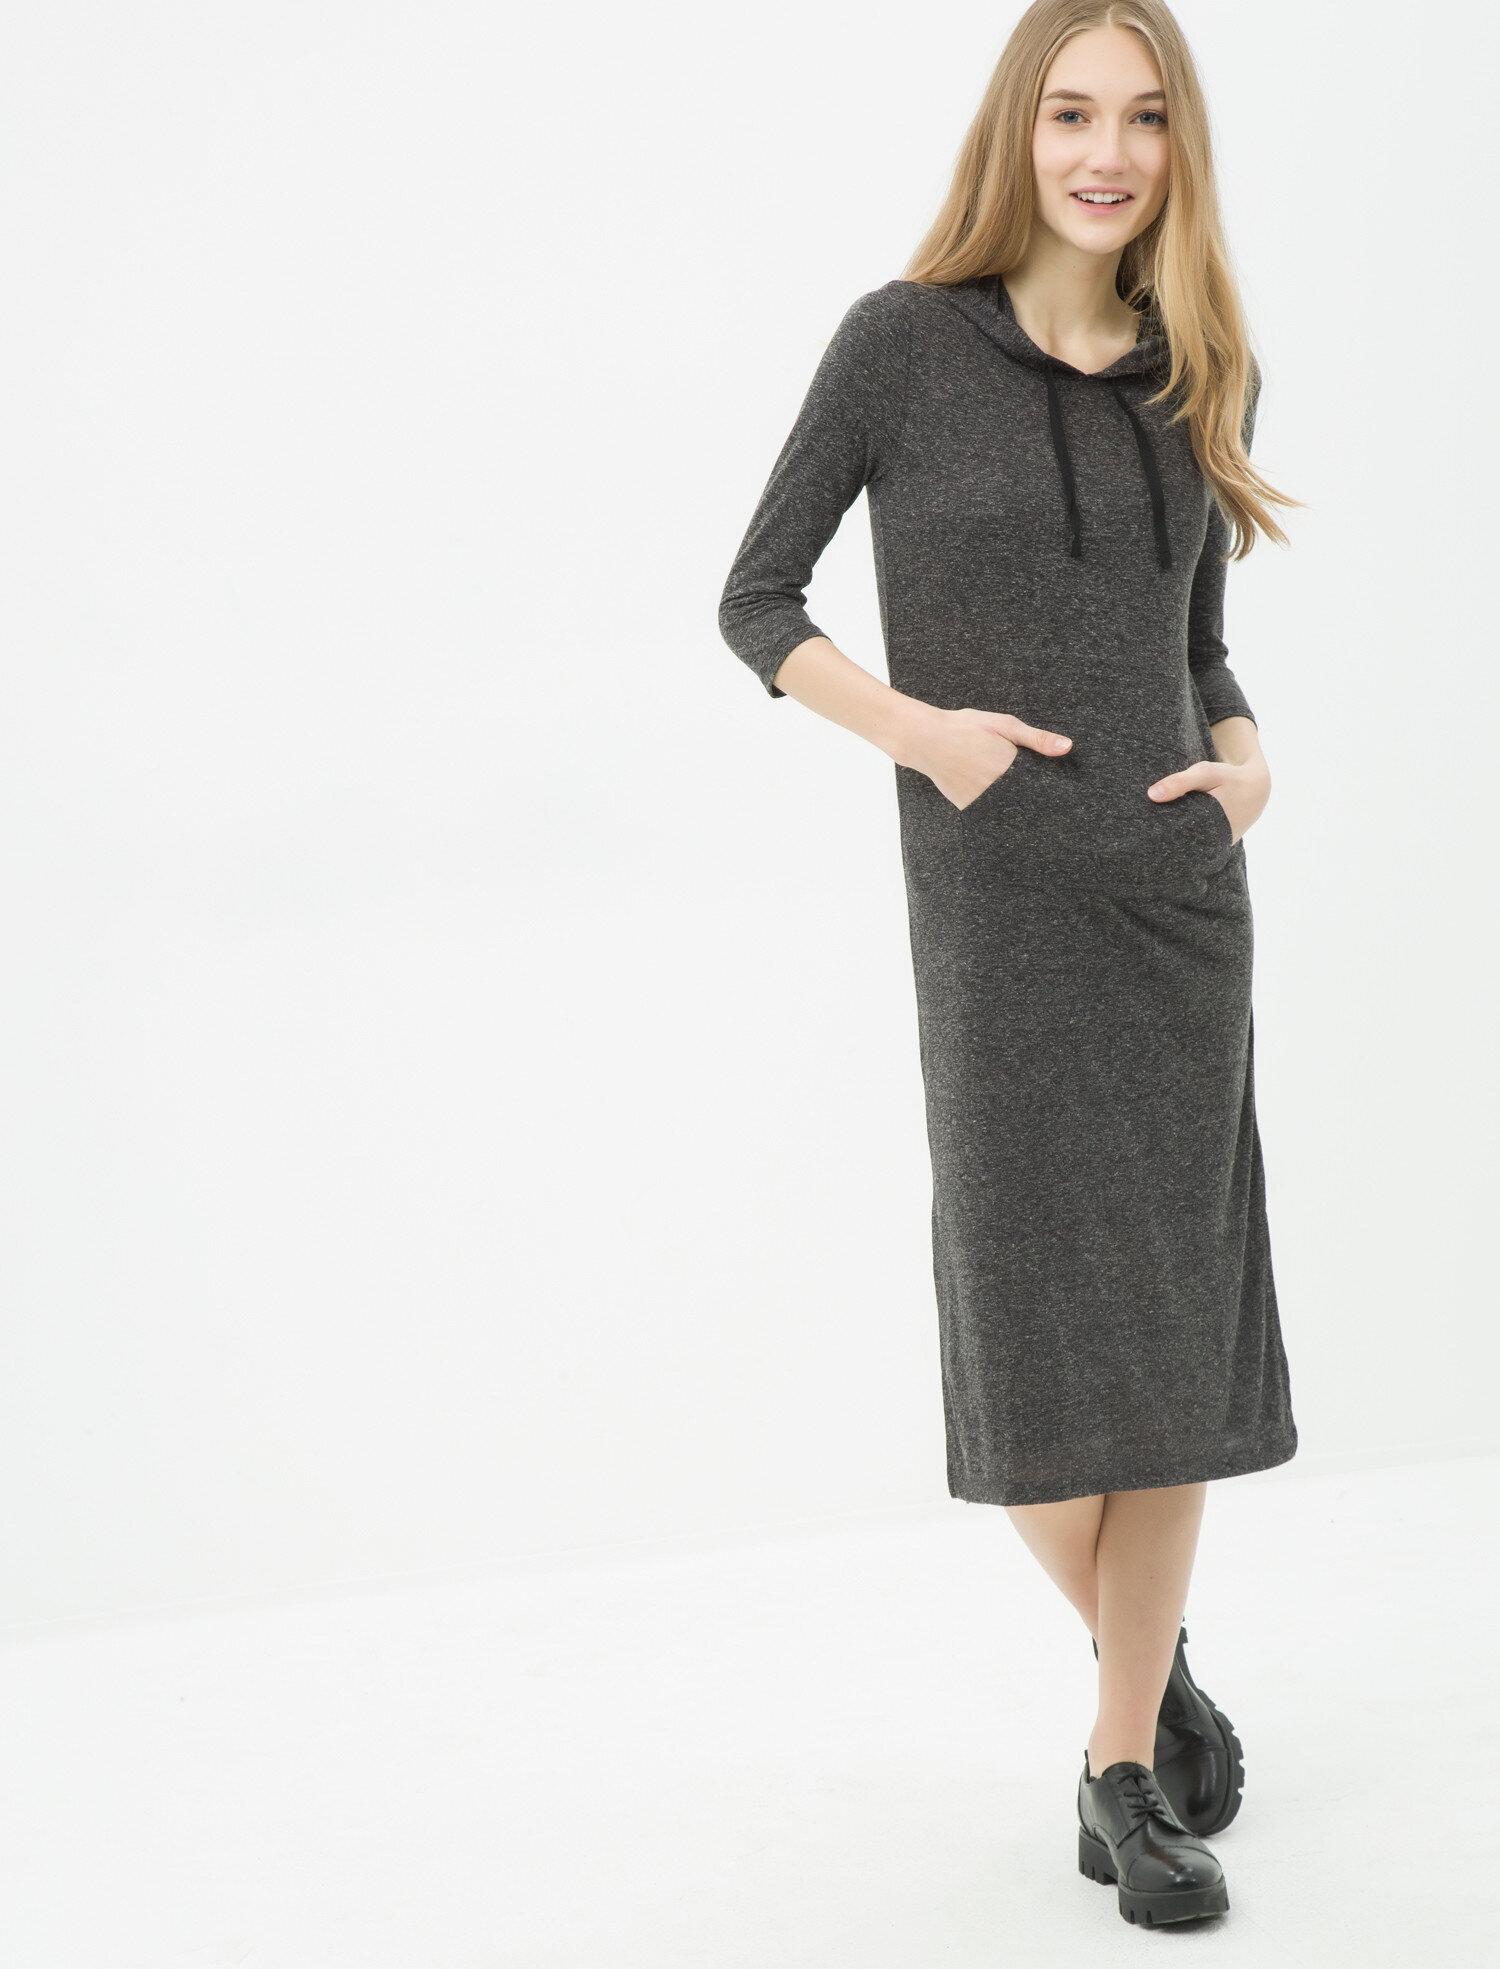 0f06a3965f1 Black Women Hooded Dress 6YAL81016OK999